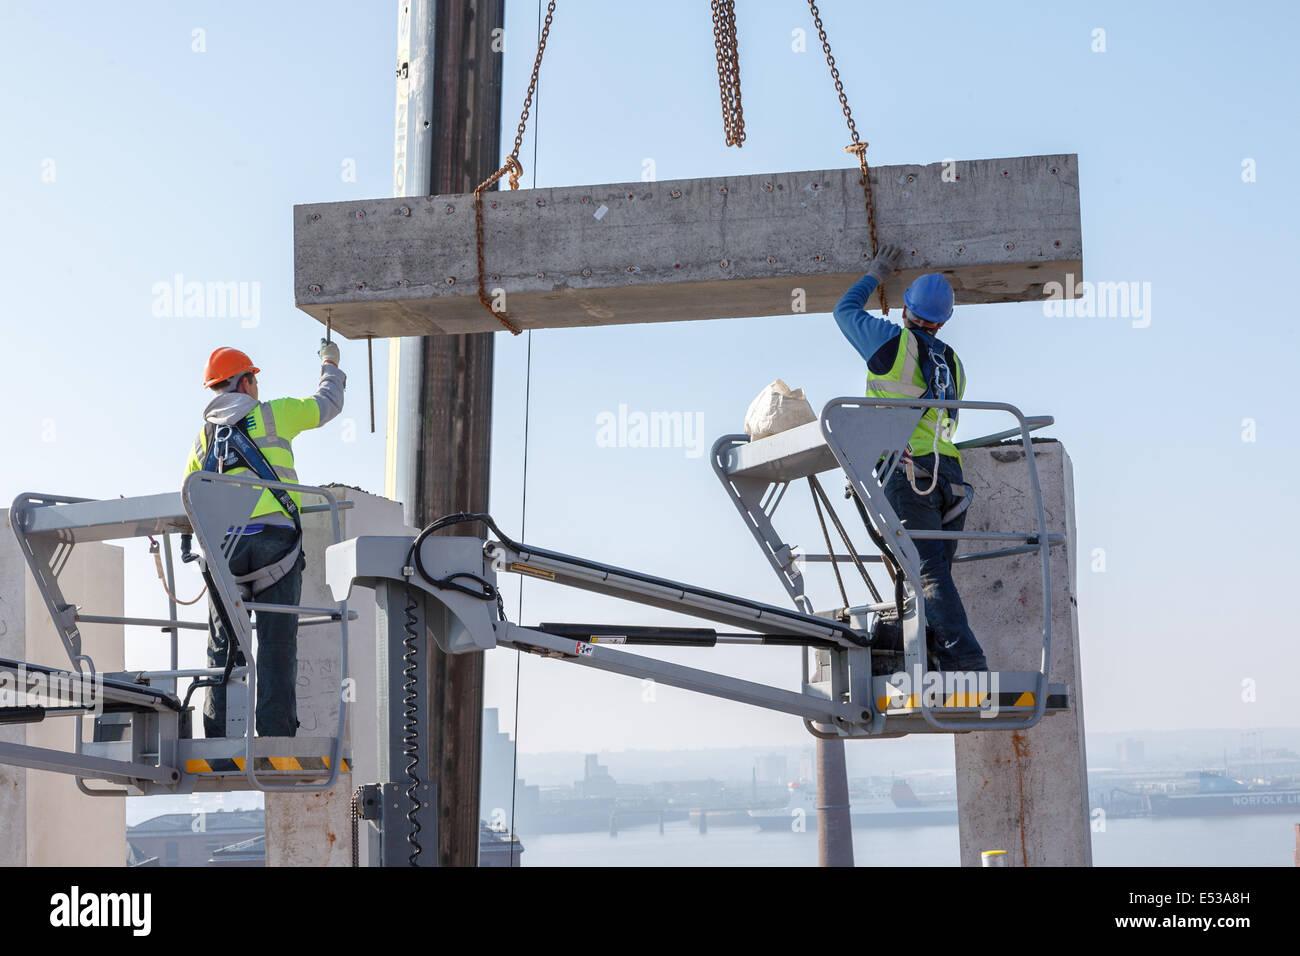 Installation of Precast Concrete Lintel,Liverpool,England,UK,Europe - Stock Image